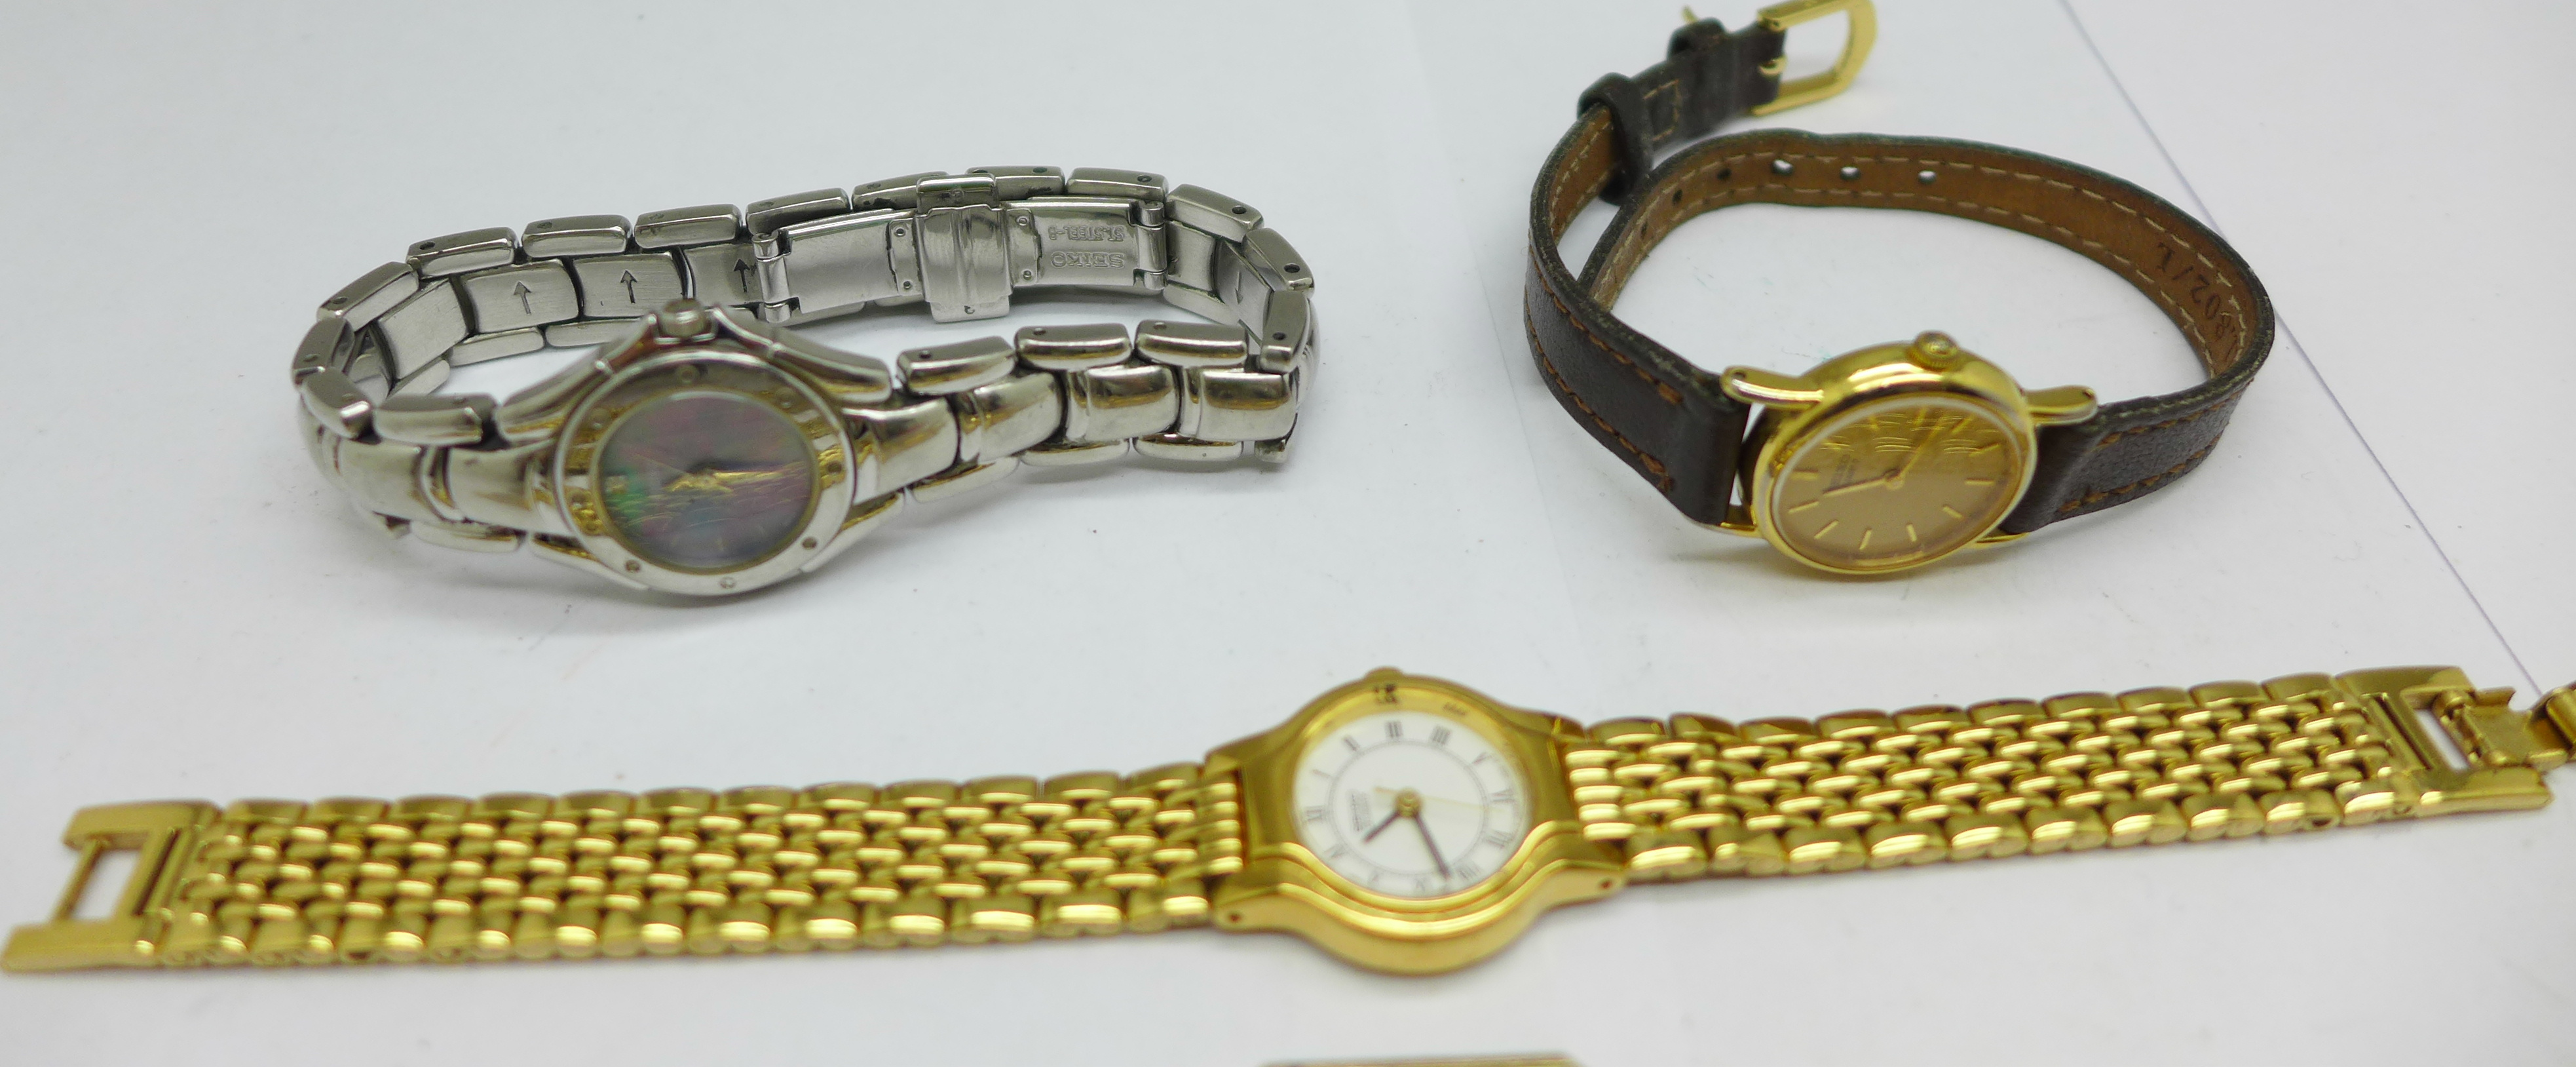 Six lady's Seiko wristwatches - Image 3 of 4